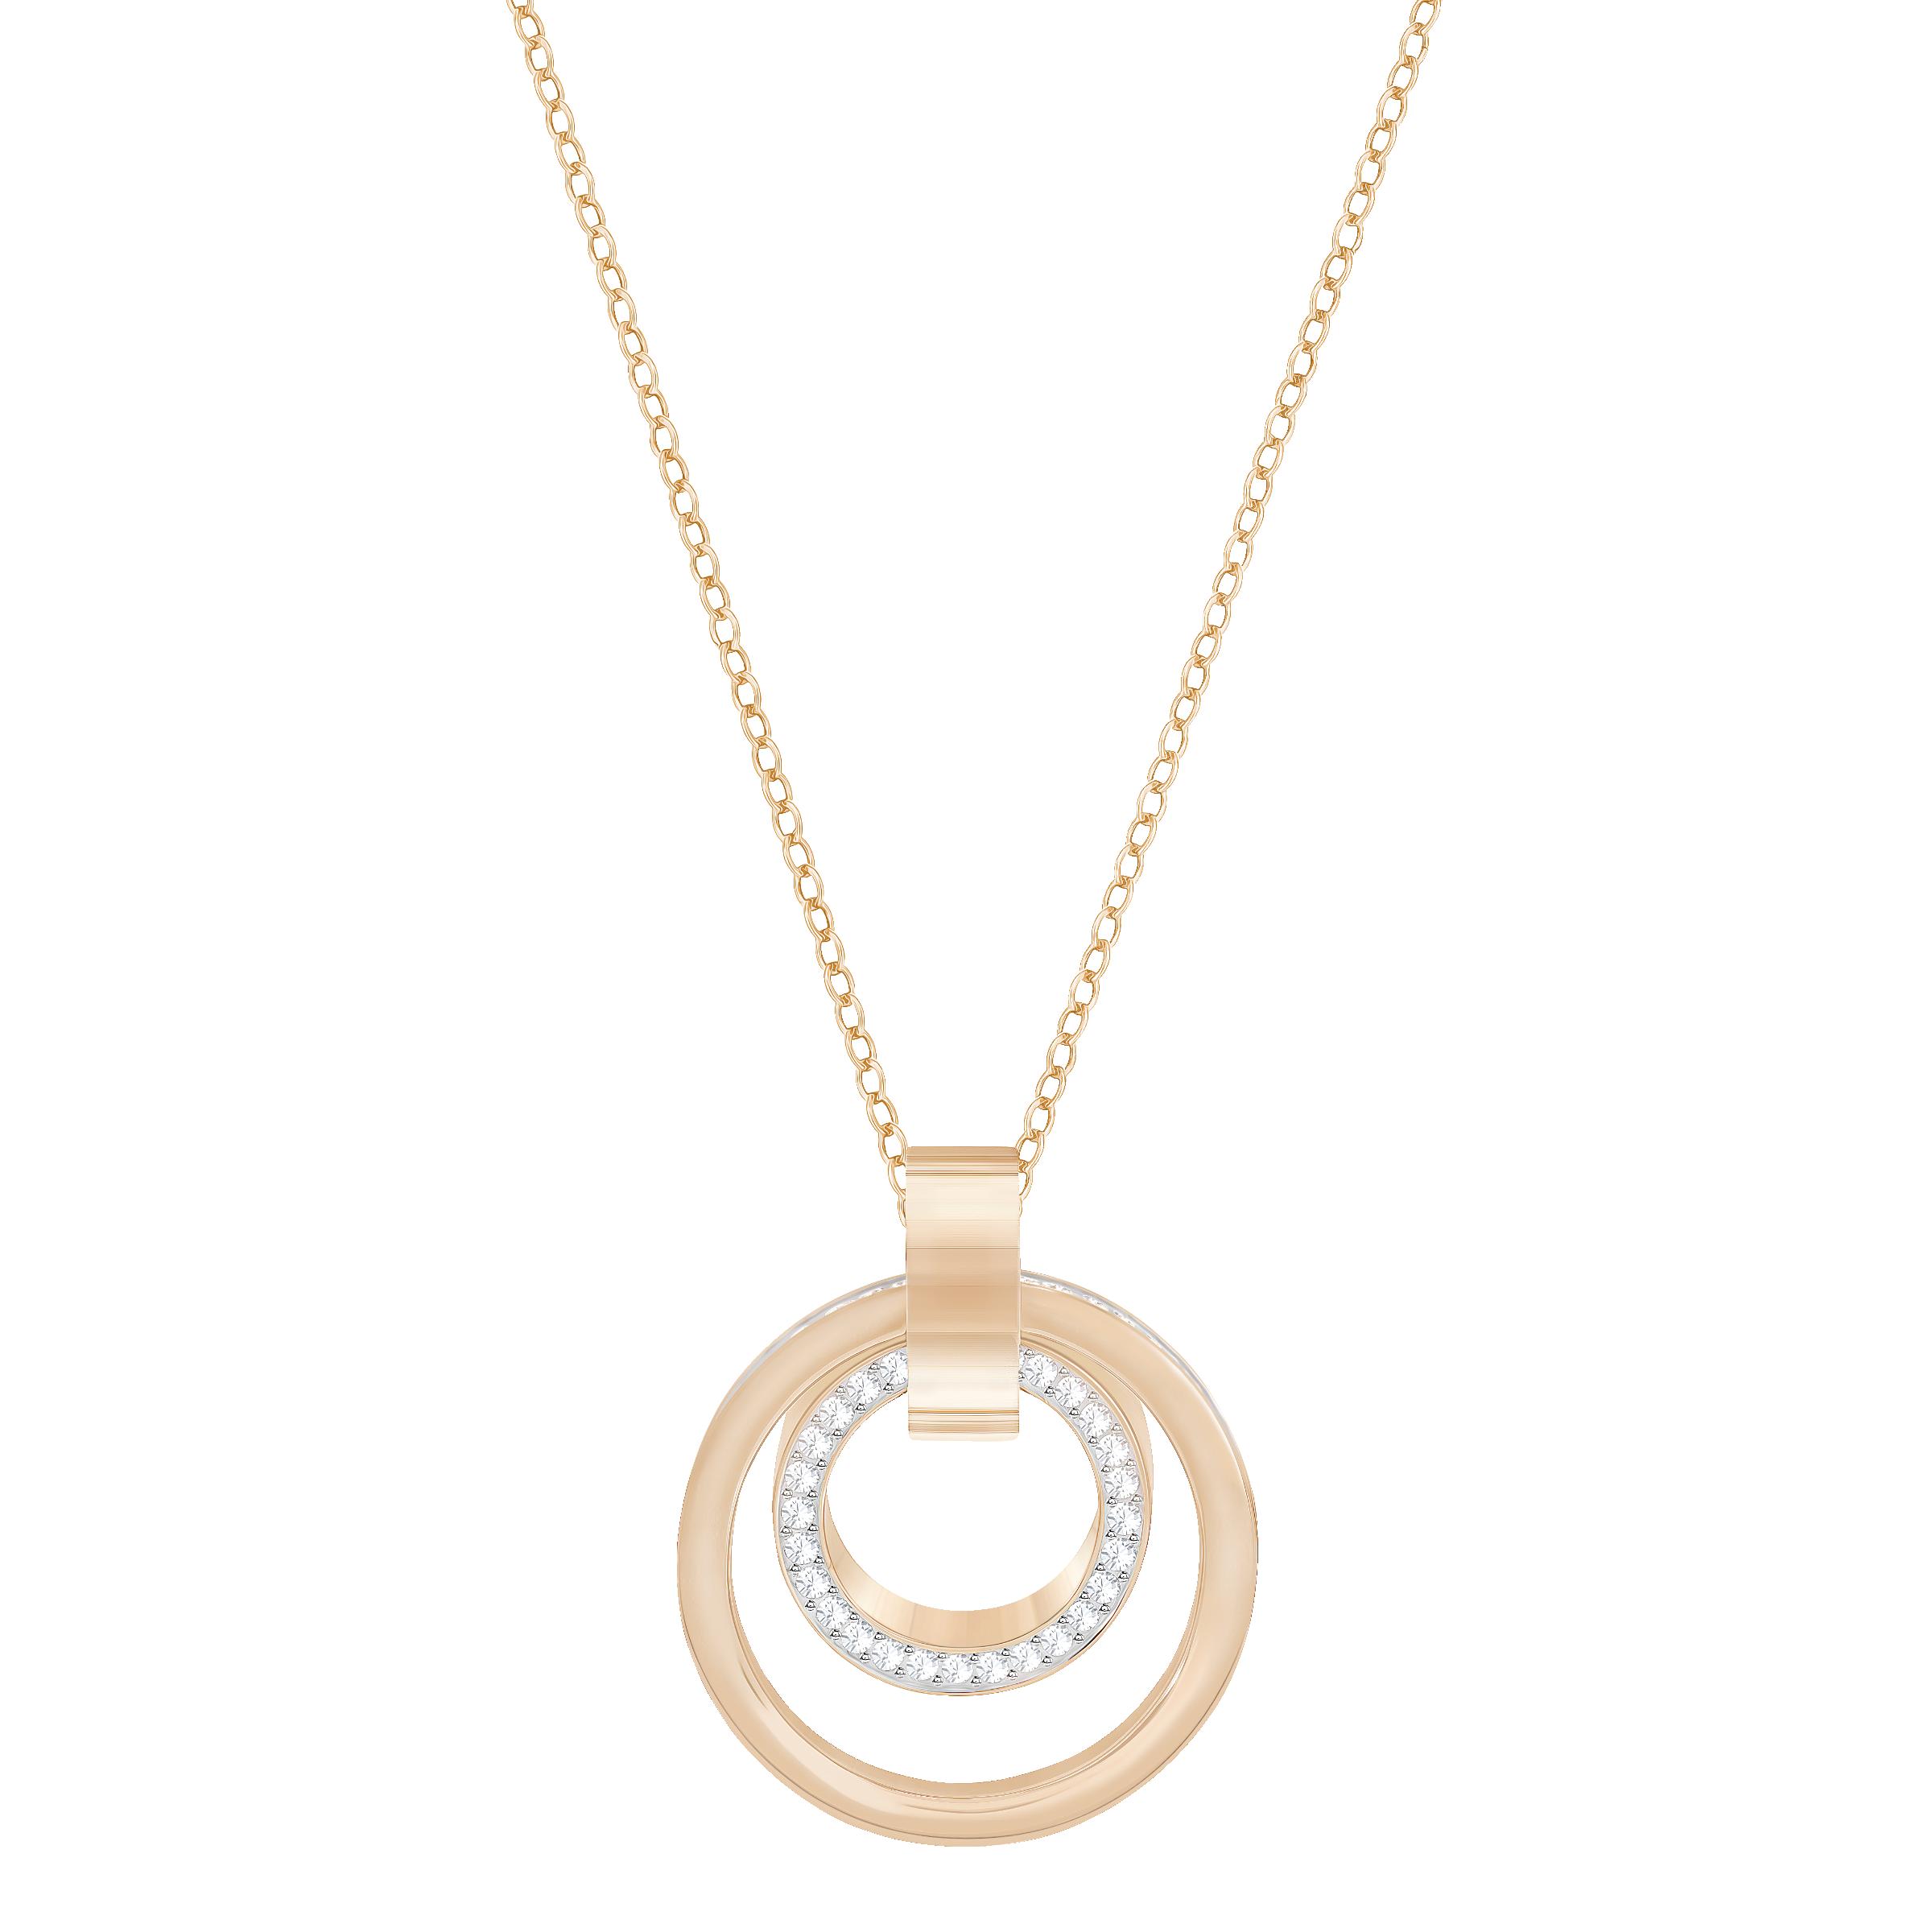 Hollow Pendant, Medium, White, Rose Gold Plated